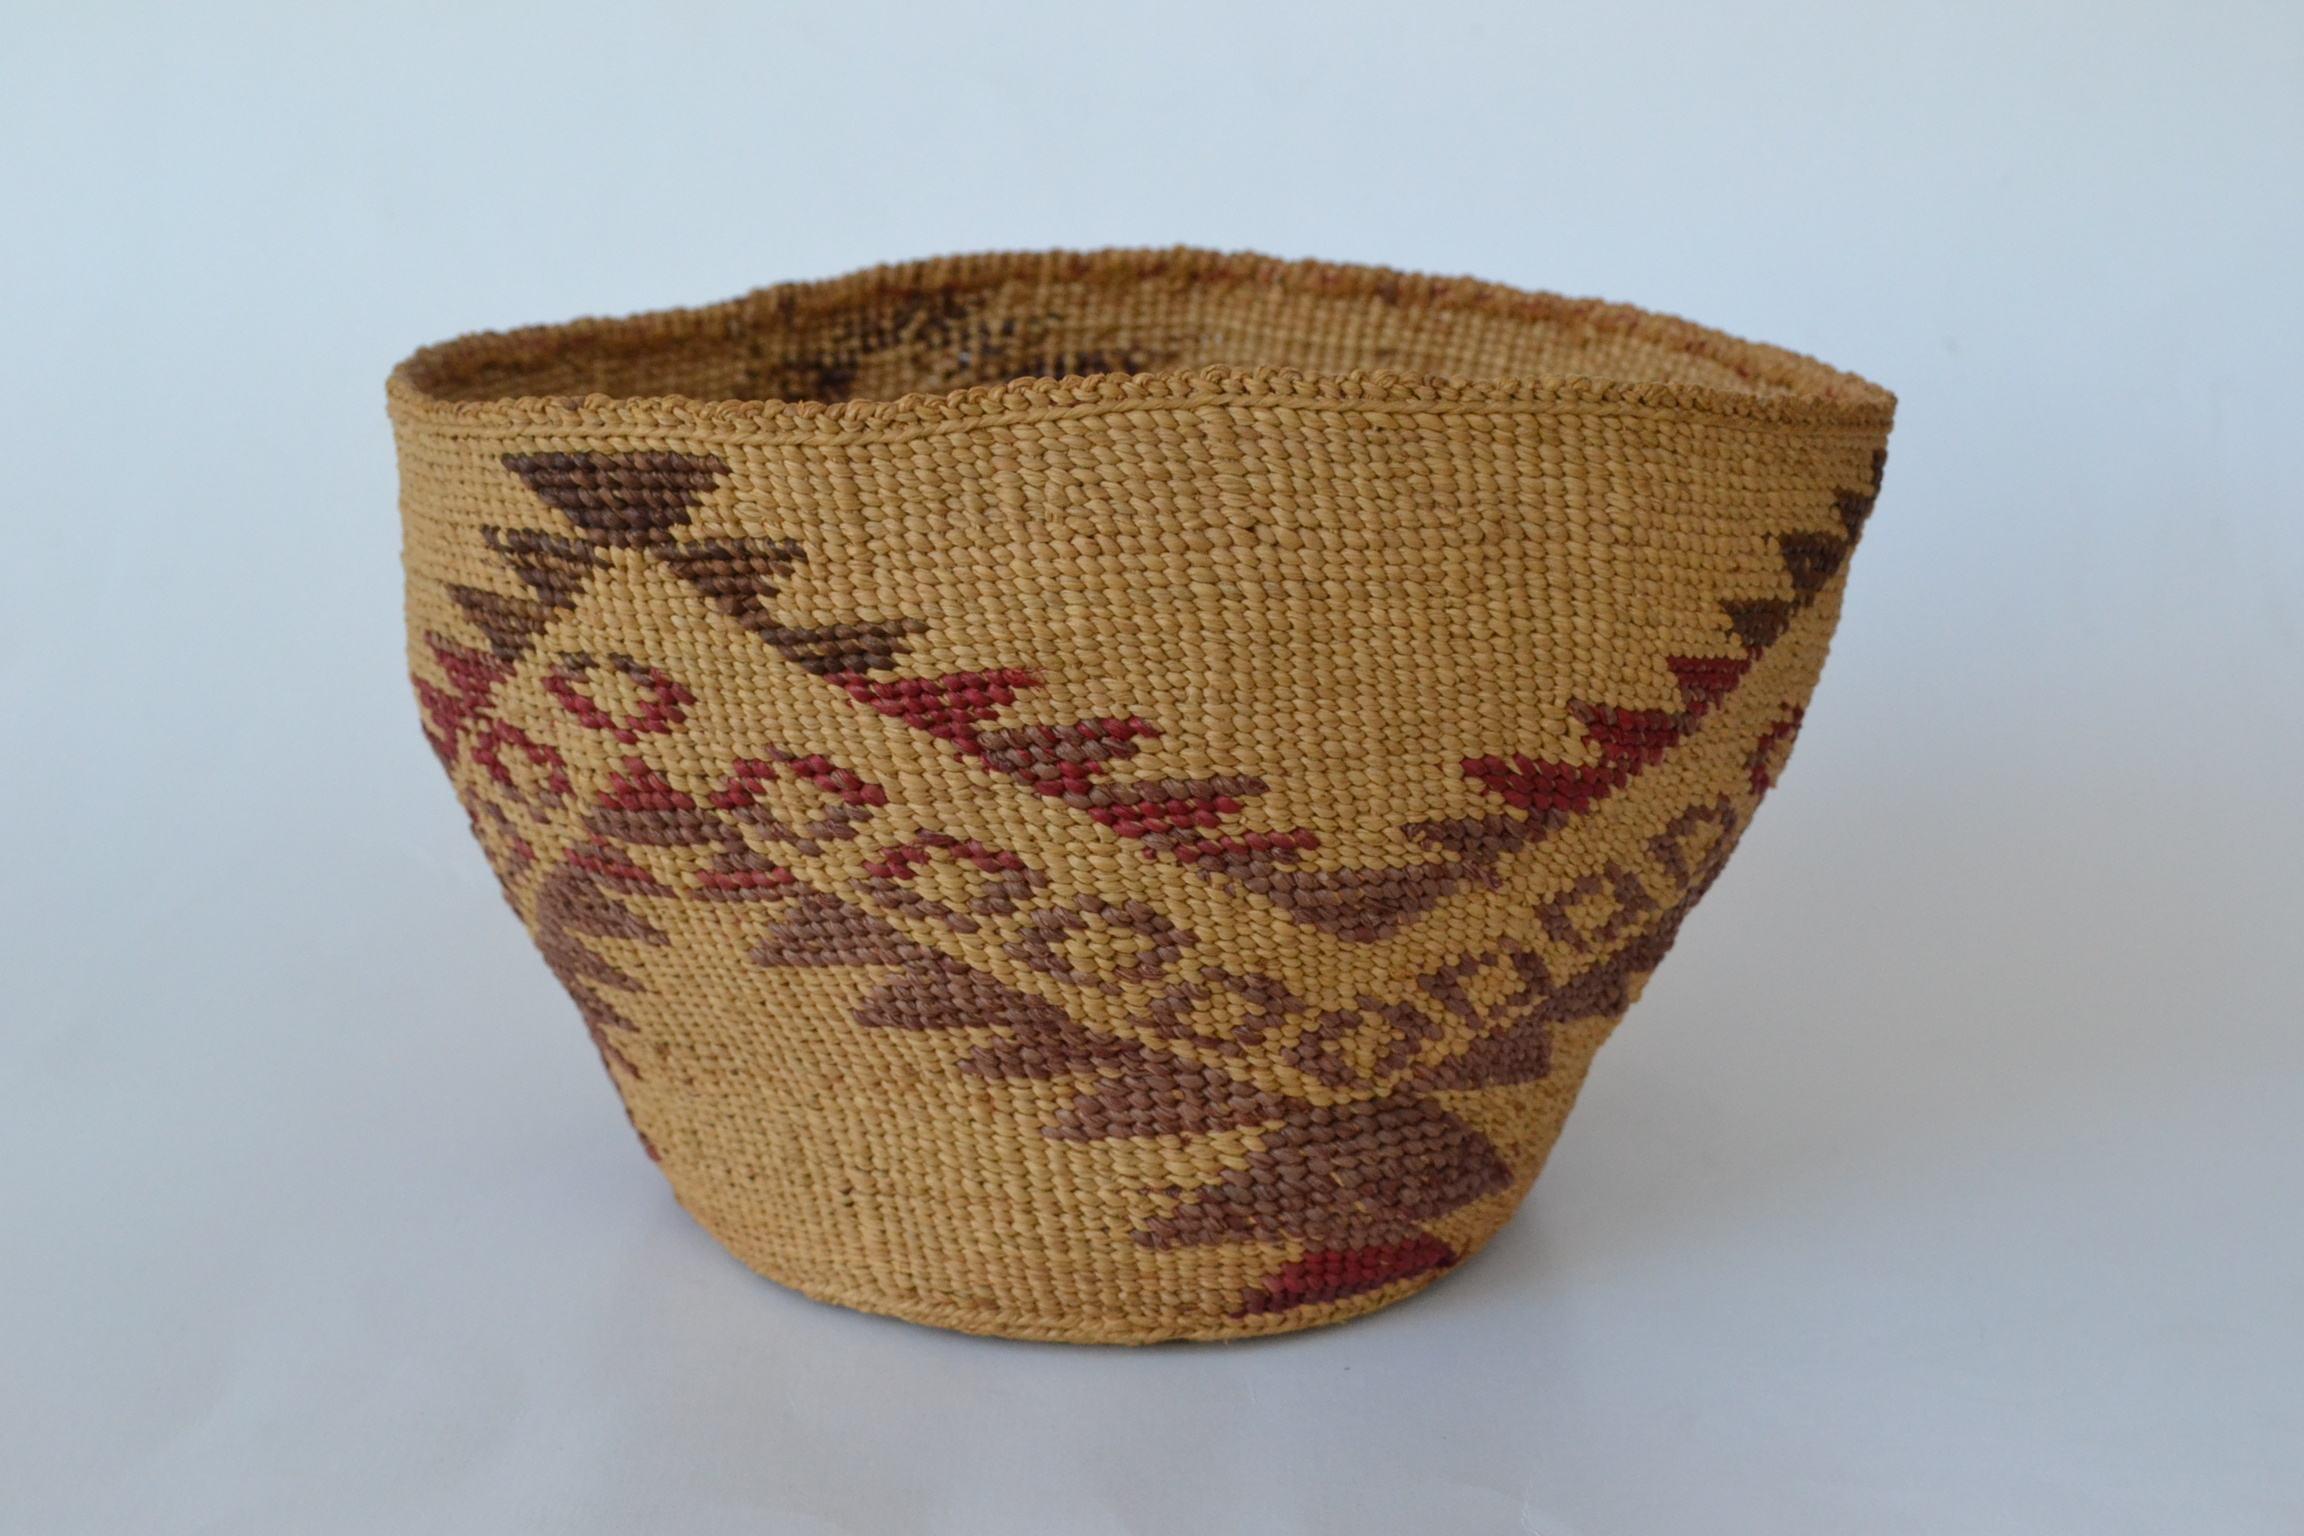 indian baskets for sale, penryn, california klamath modoc woven basket